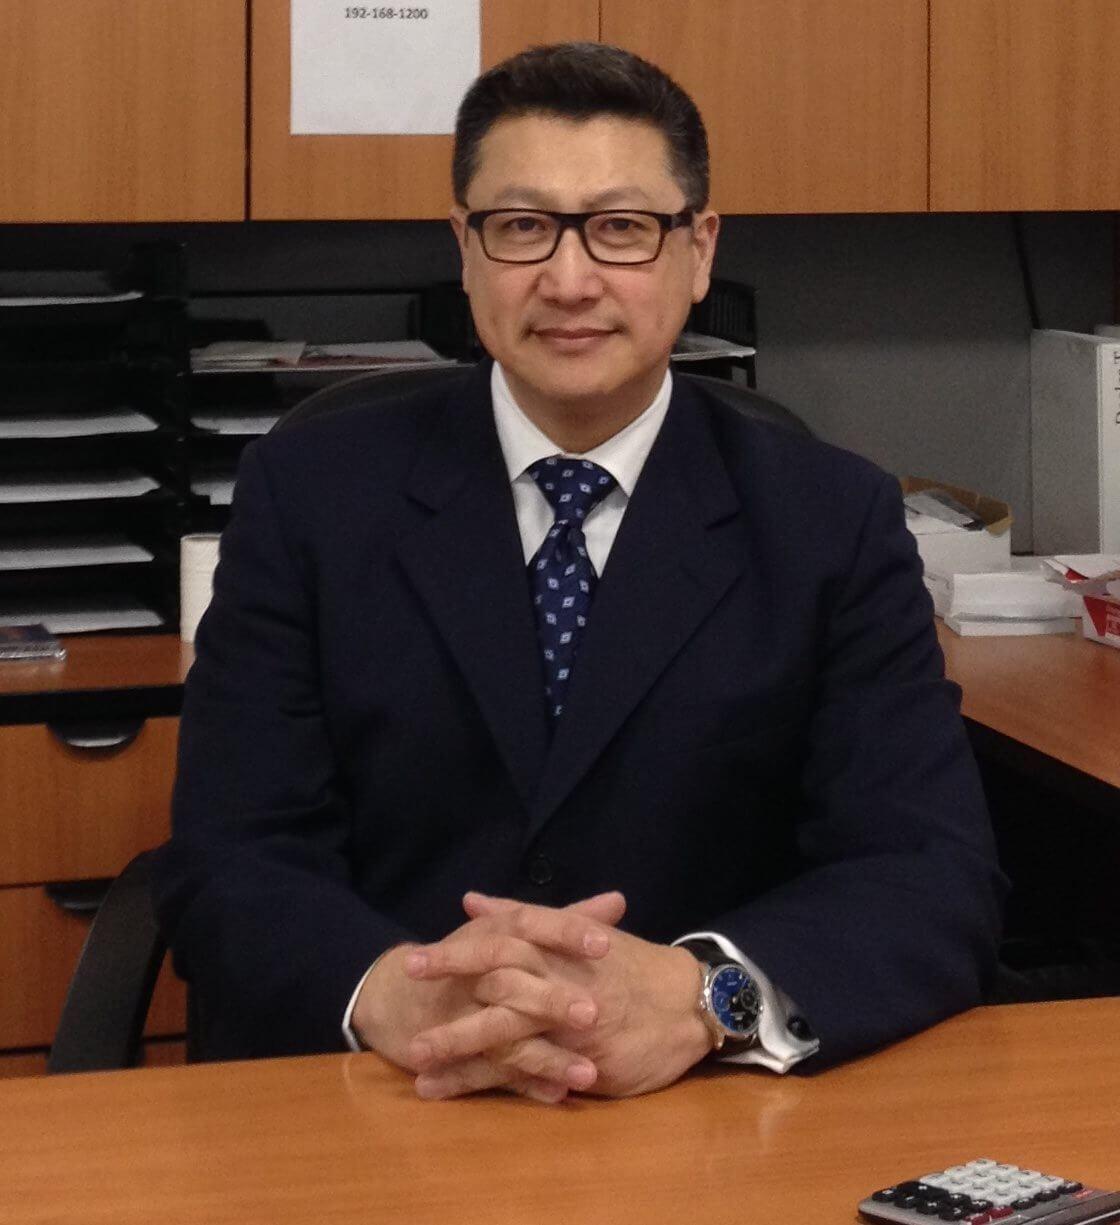 Manny Martinez